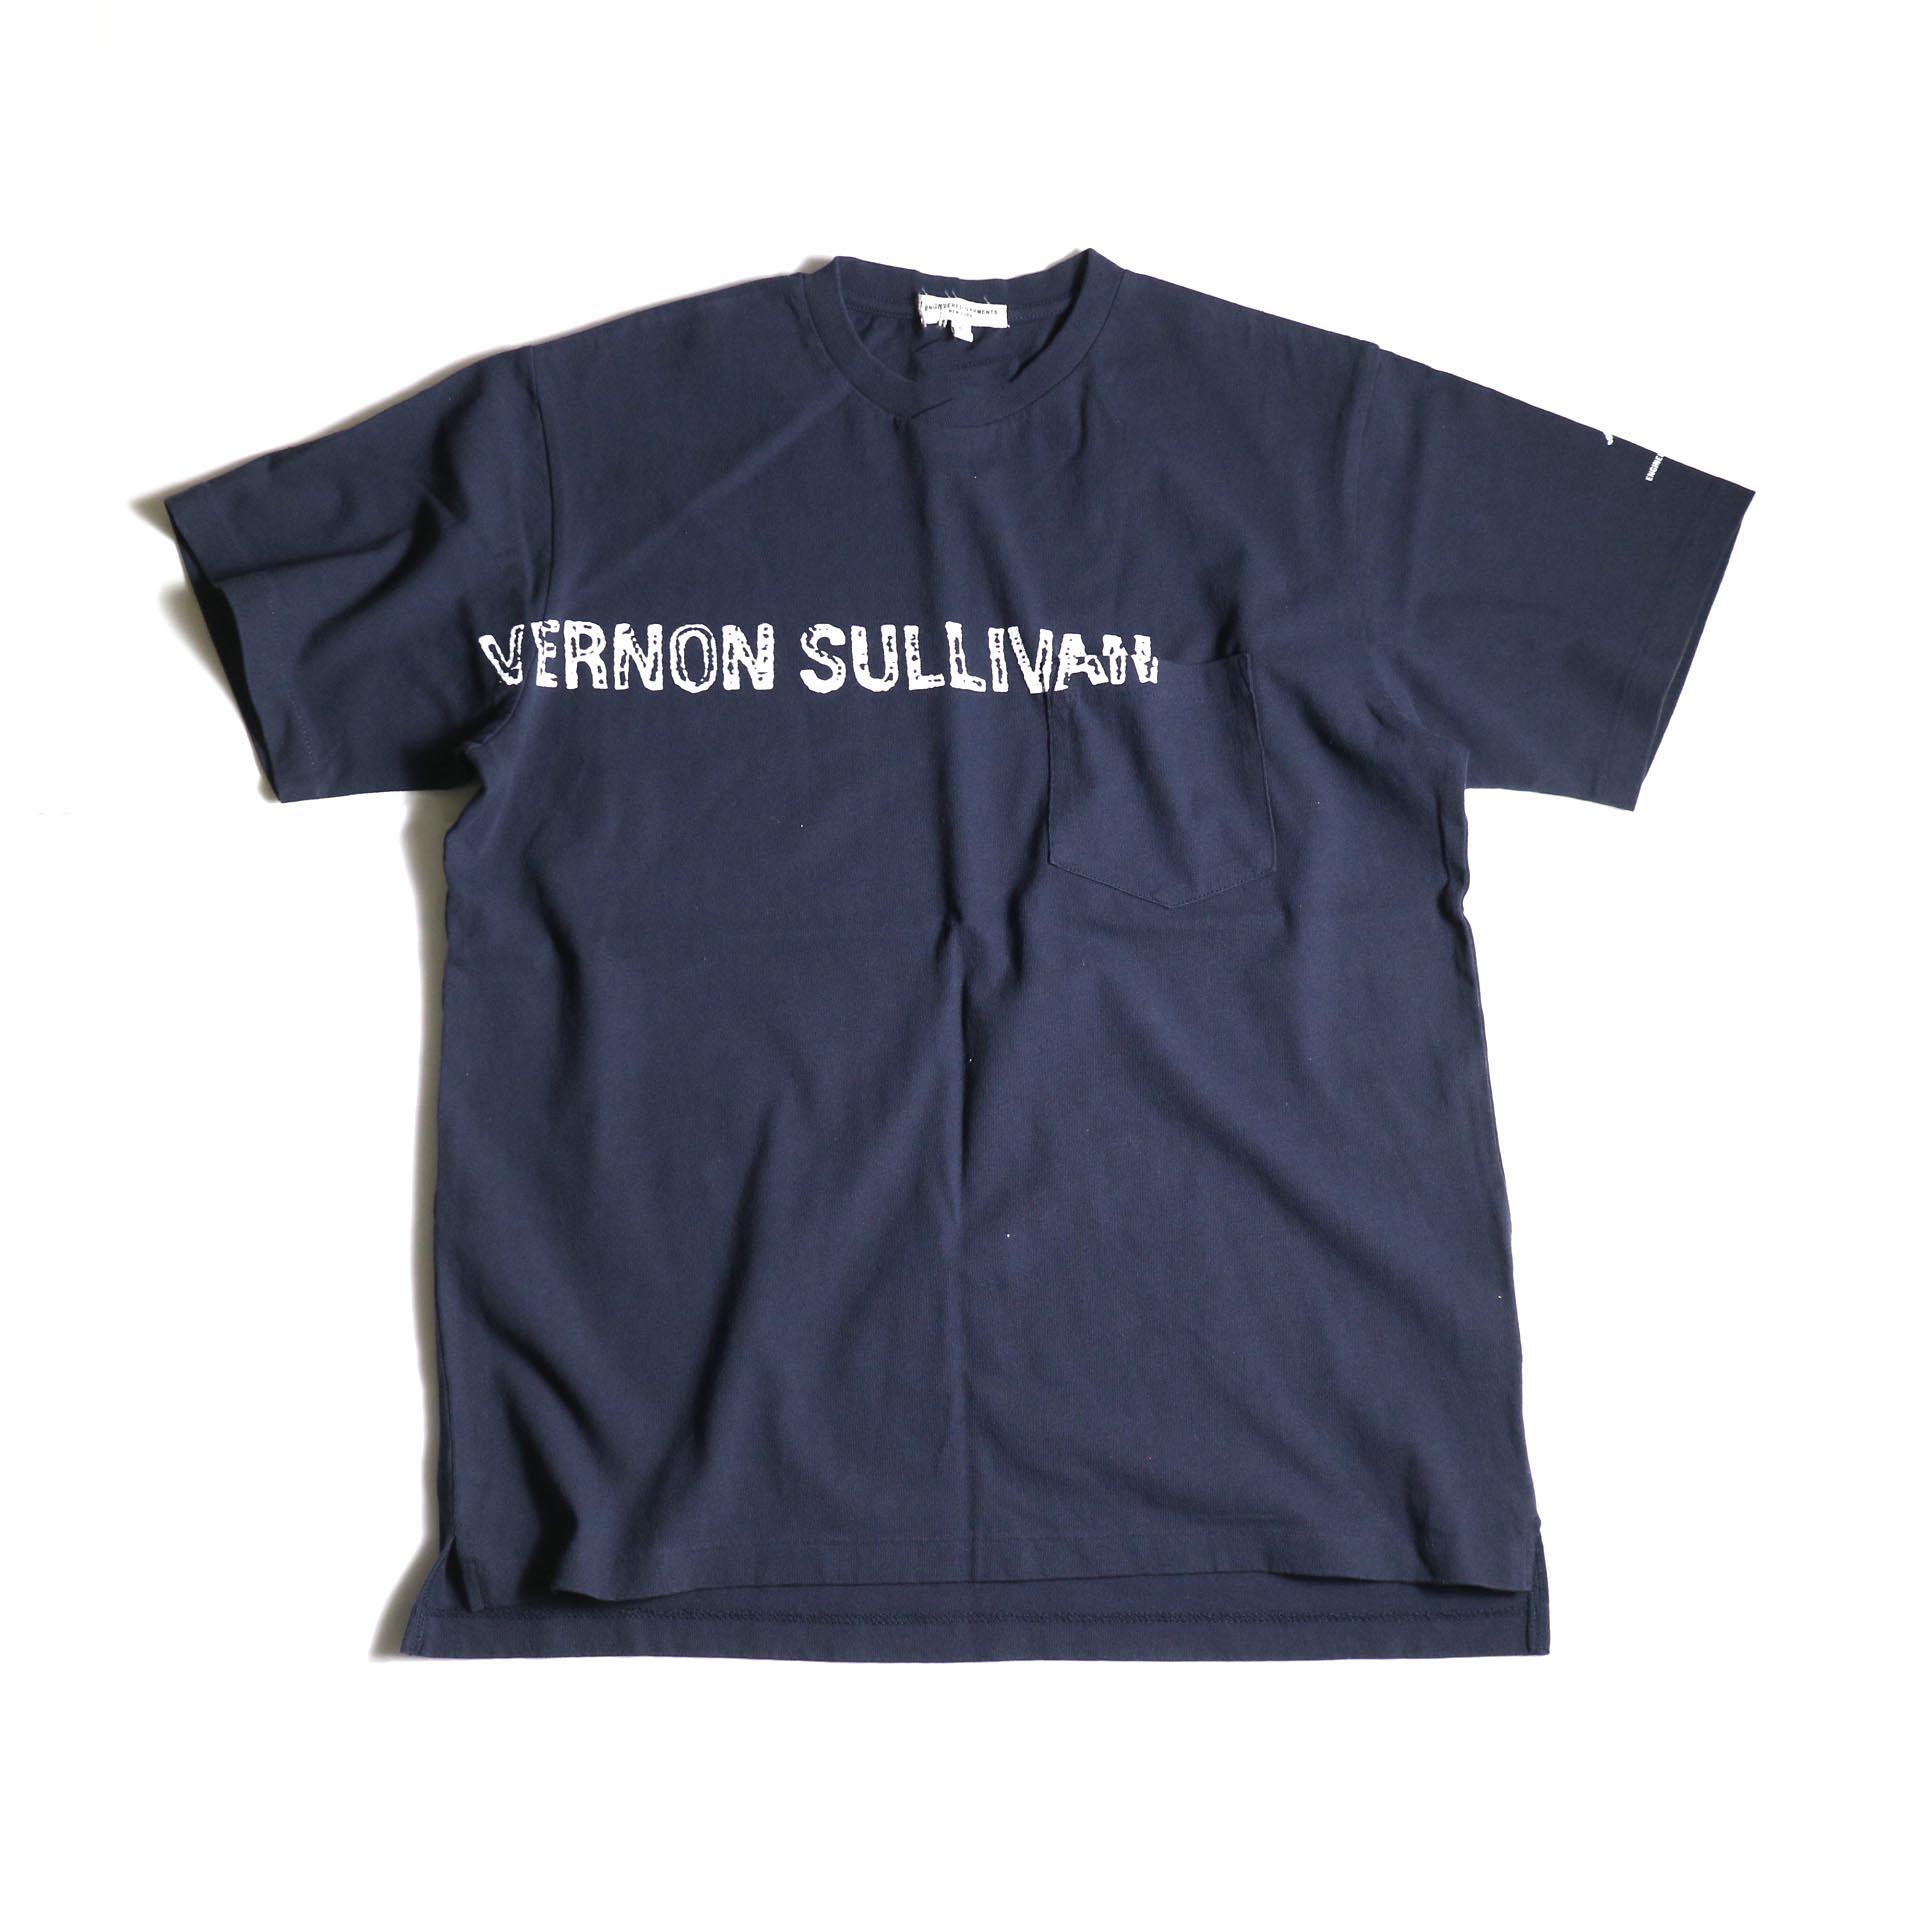 Engineered Garments / Printed Cross Crew Neck T-shirt -Vernon (Navy)